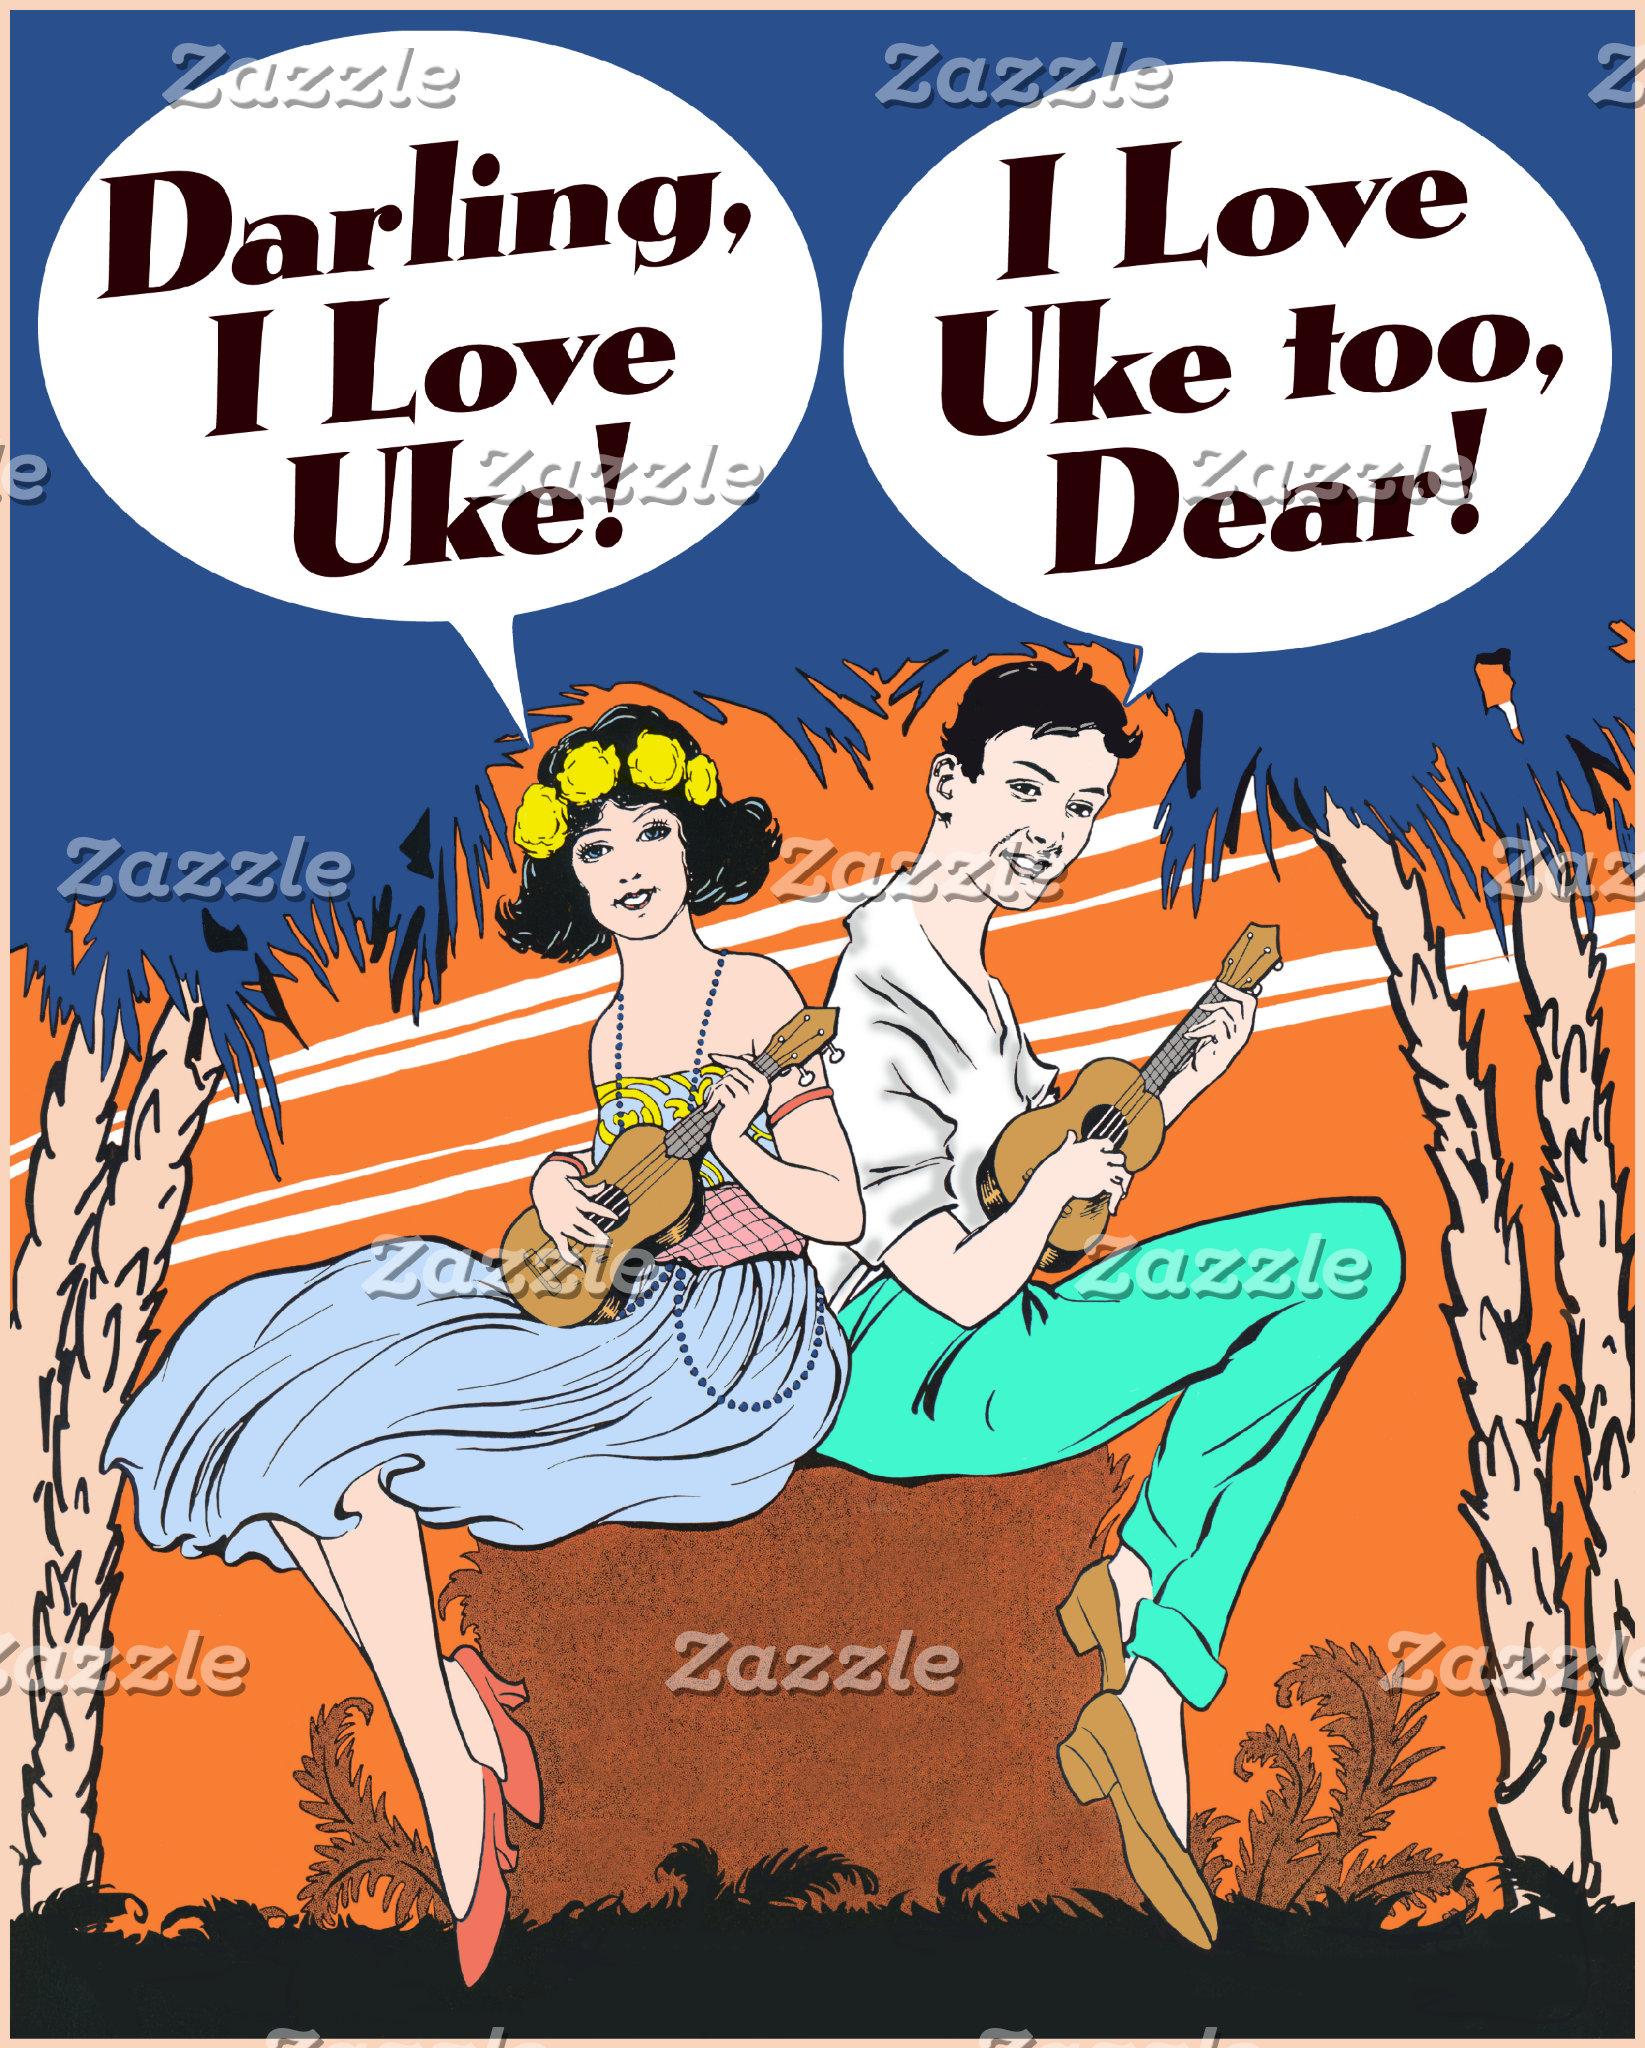 I Love Uke!